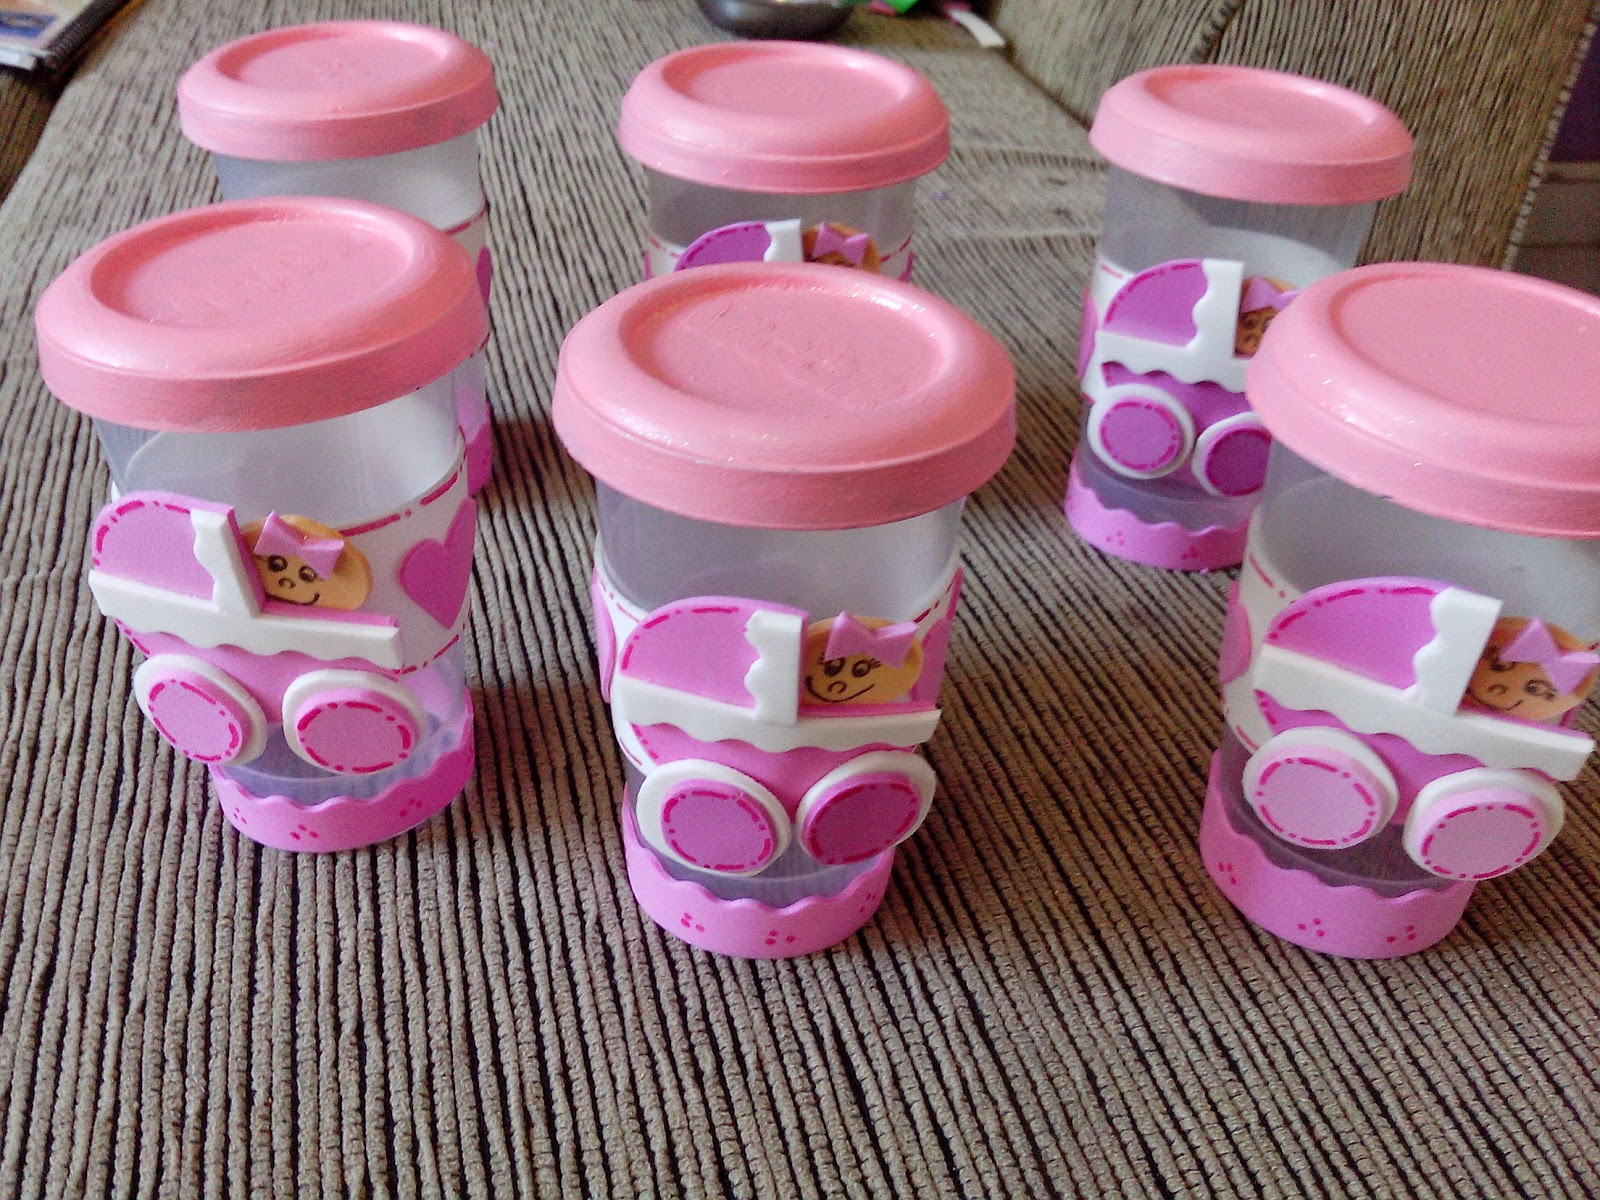 Adesivo Para Levantar Mama Onde Comprar ~ Artesanato SUD Artesanato reciclável, reaproveitando